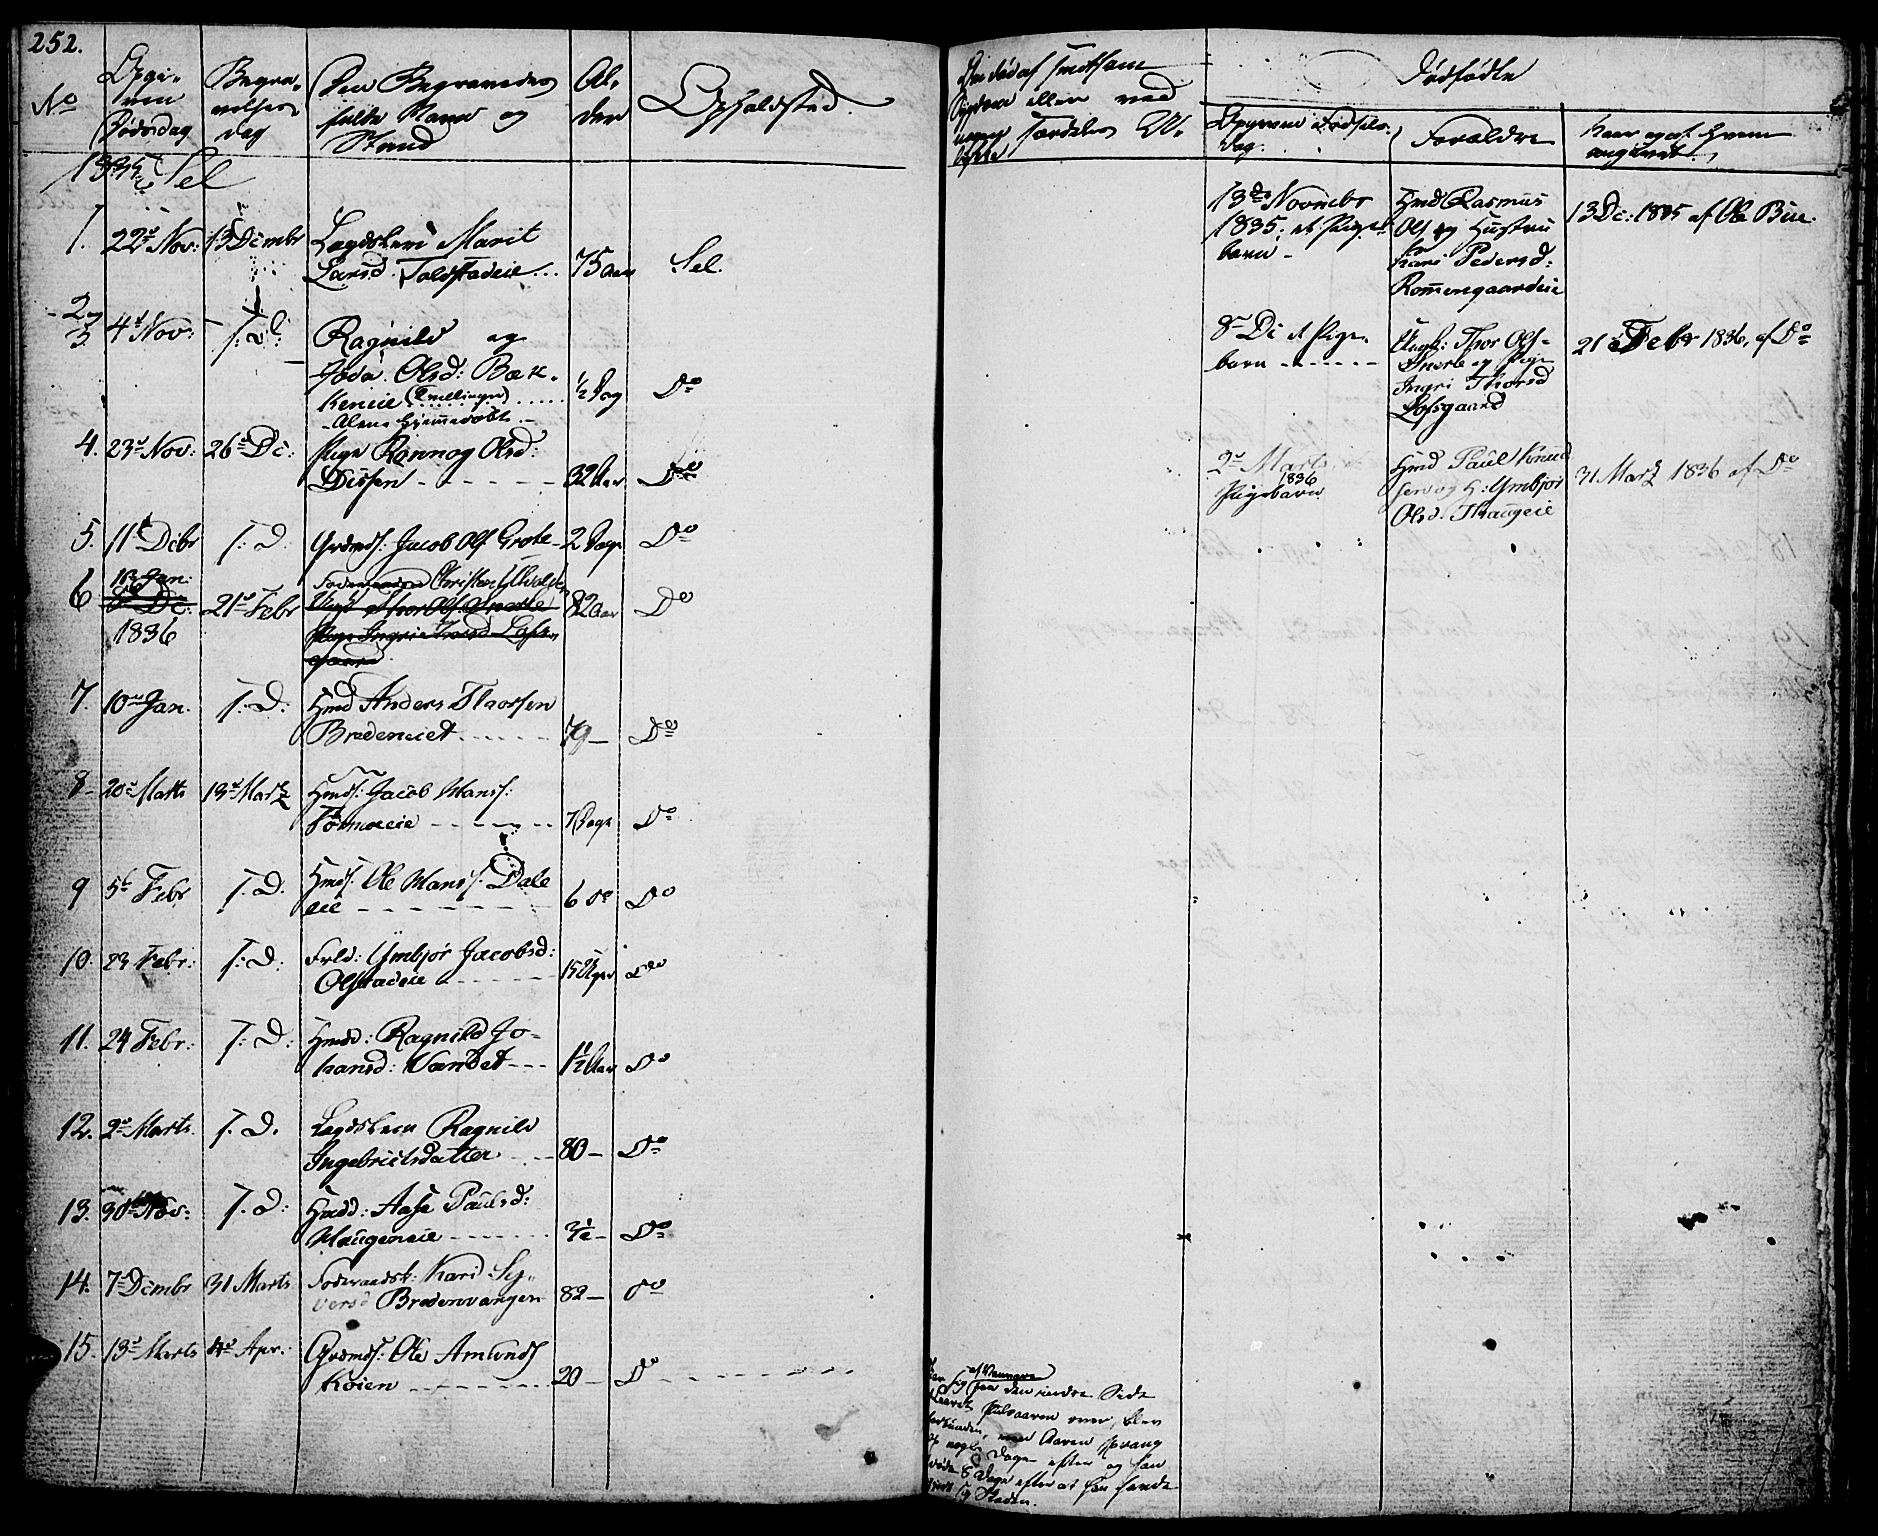 SAH, Vågå prestekontor, Ministerialbok nr. 4 /3, 1834-1842, s. 252